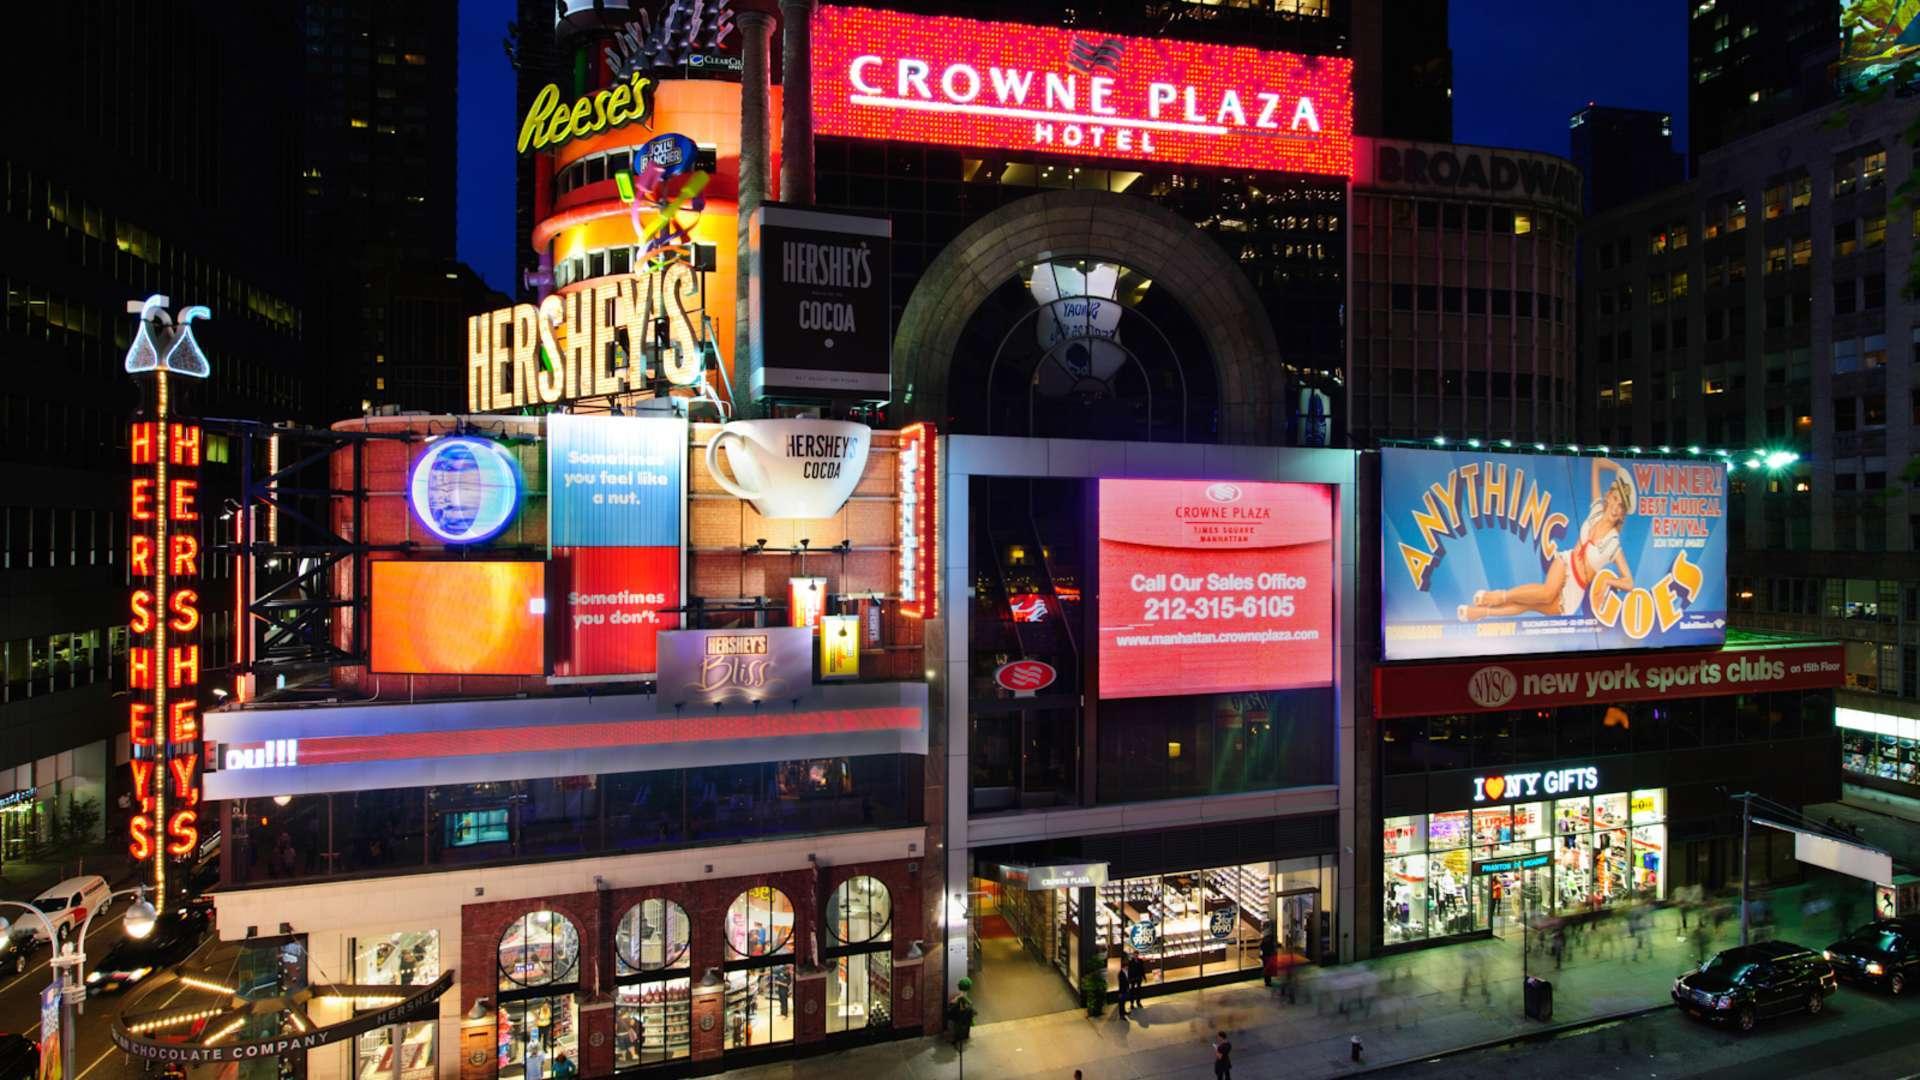 Crowne Plaza Times Square